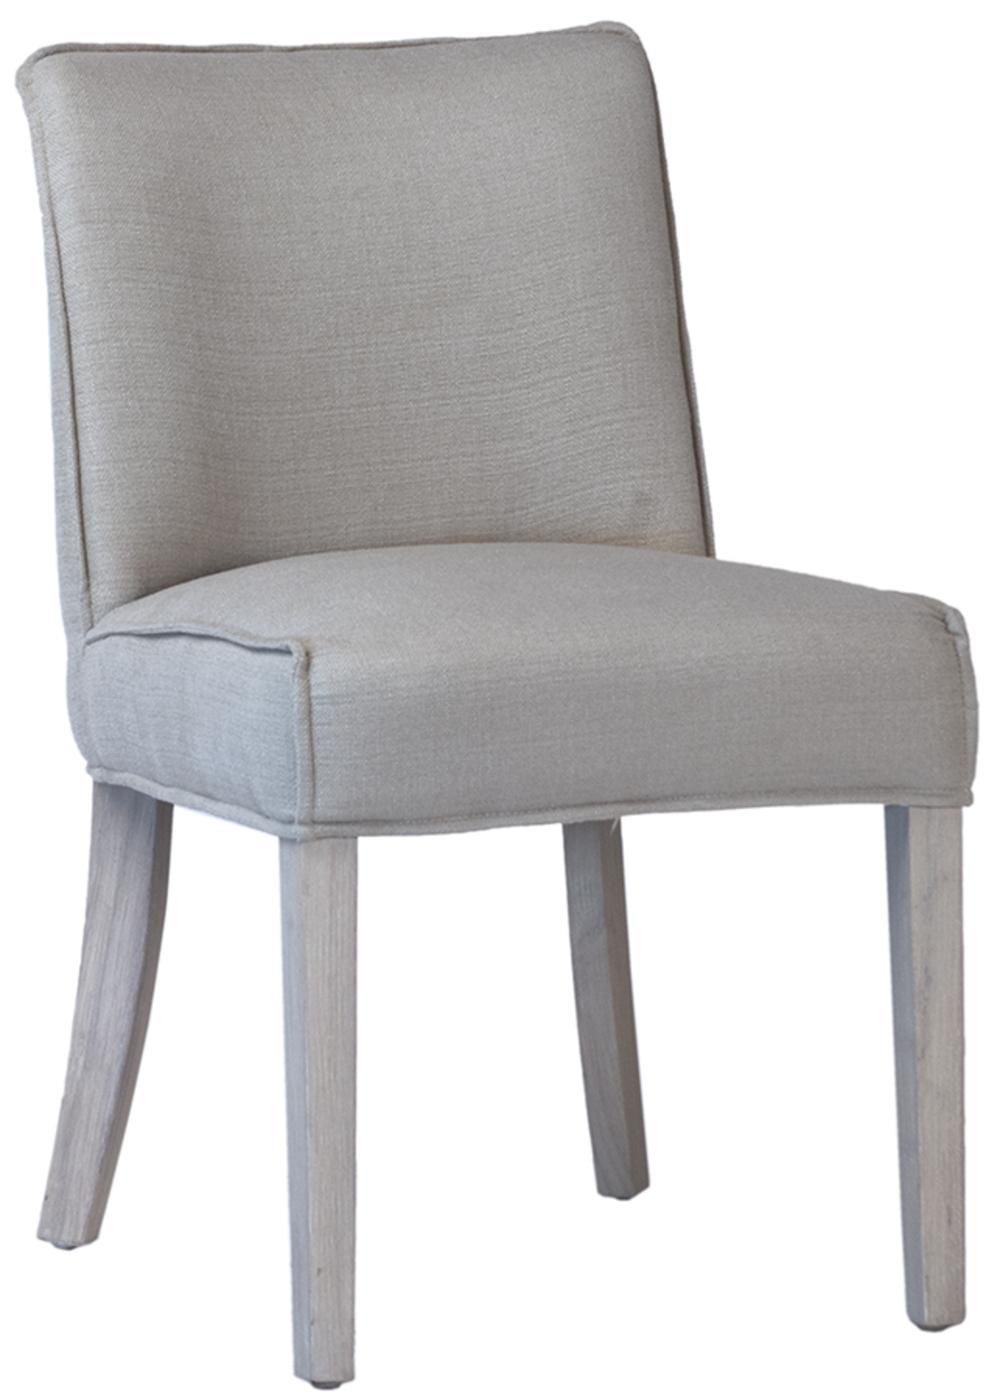 Dovetail Furniture - Tiba Dining Chair